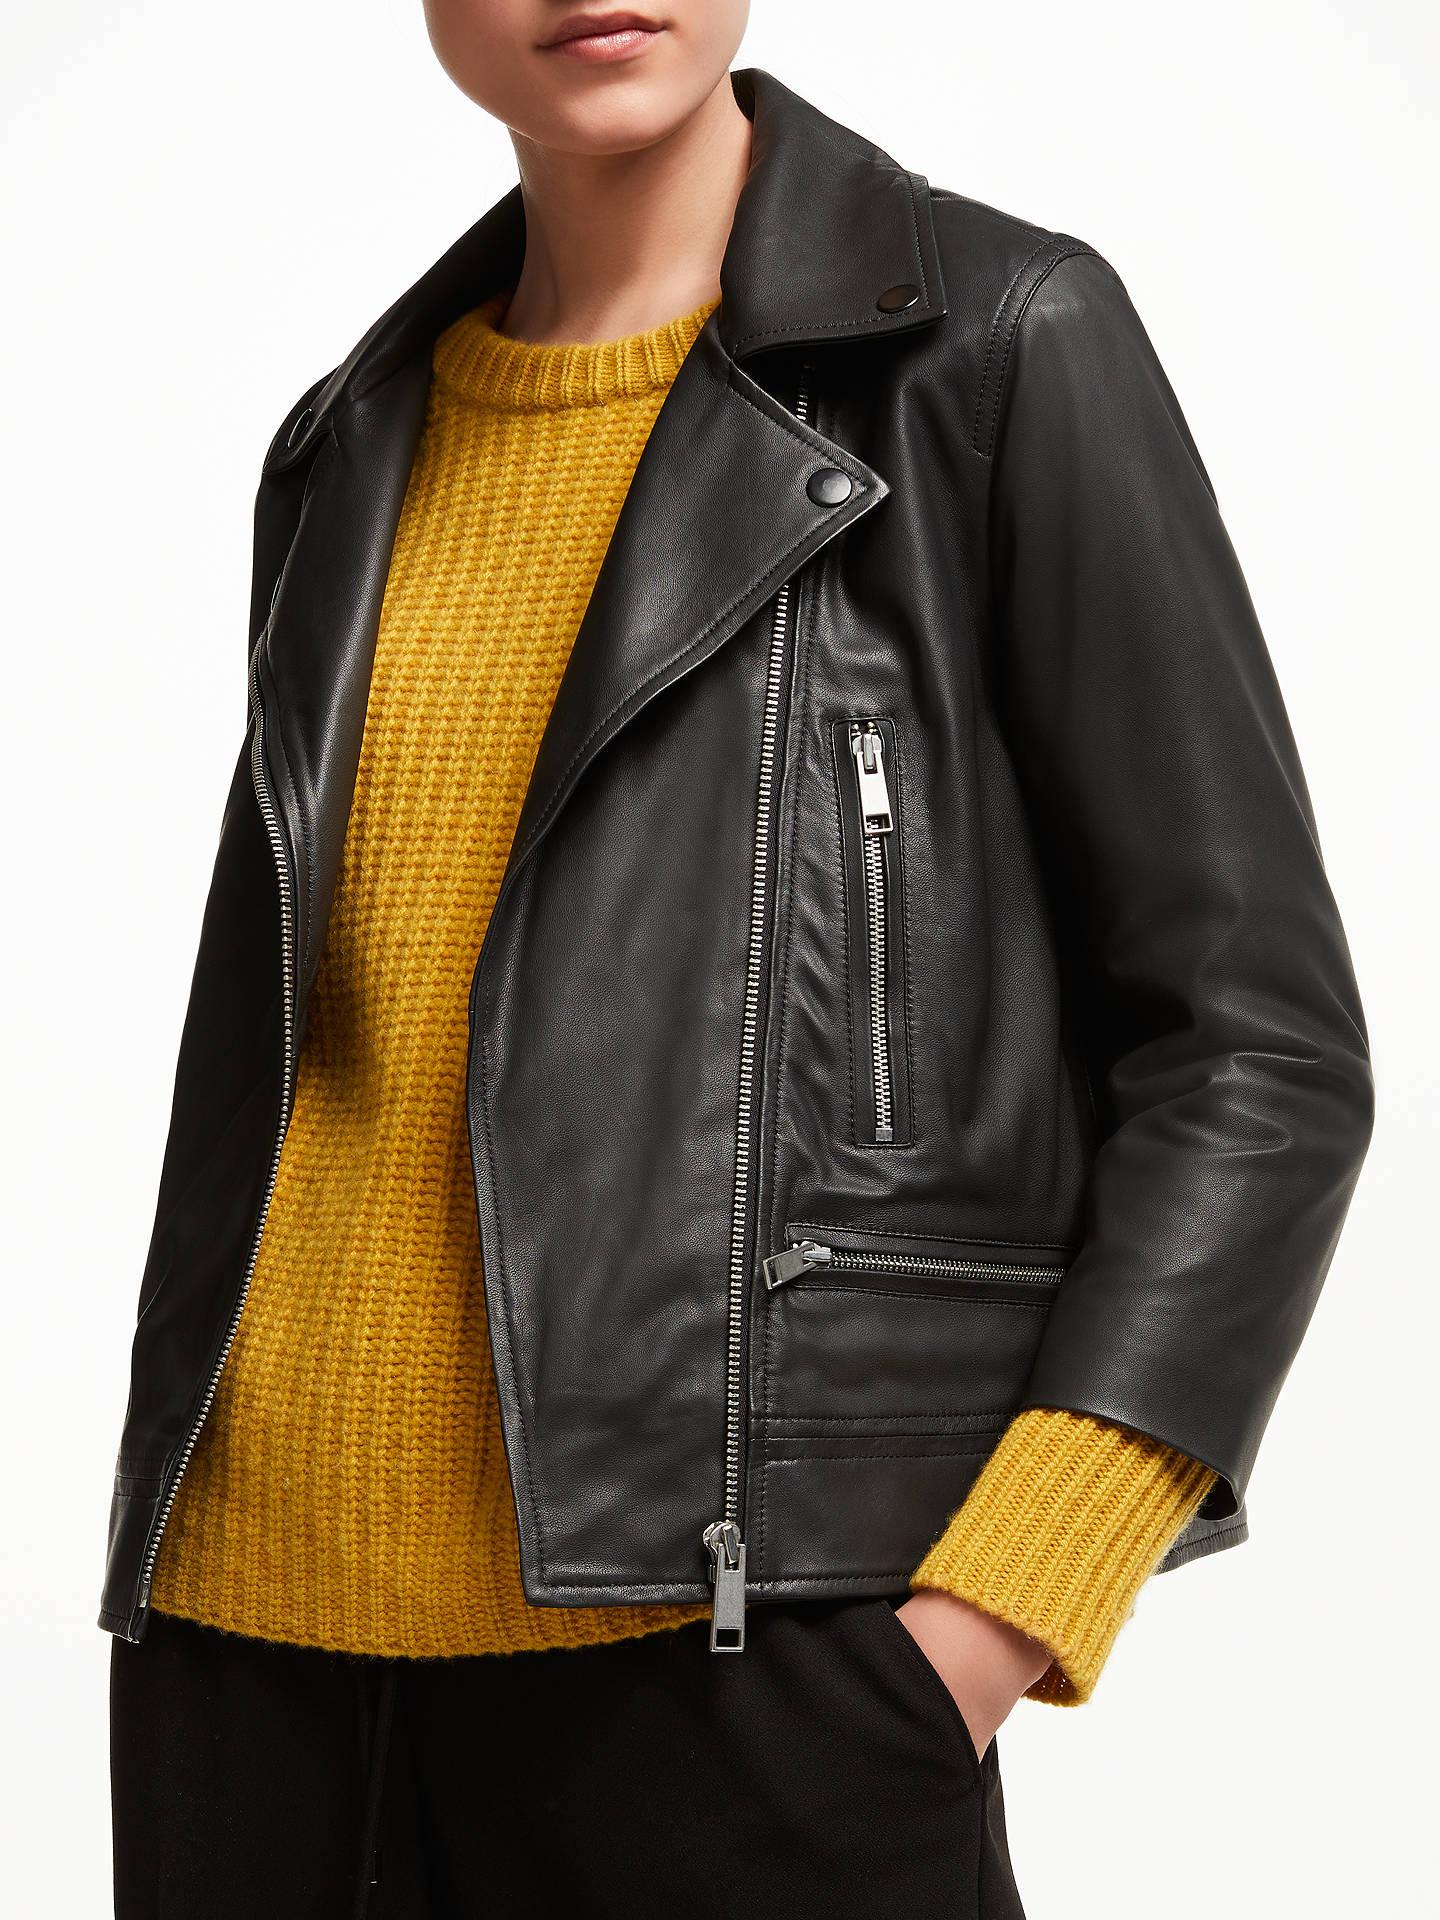 7184e34d5 John Lewis   Partners Leather Biker Jacket